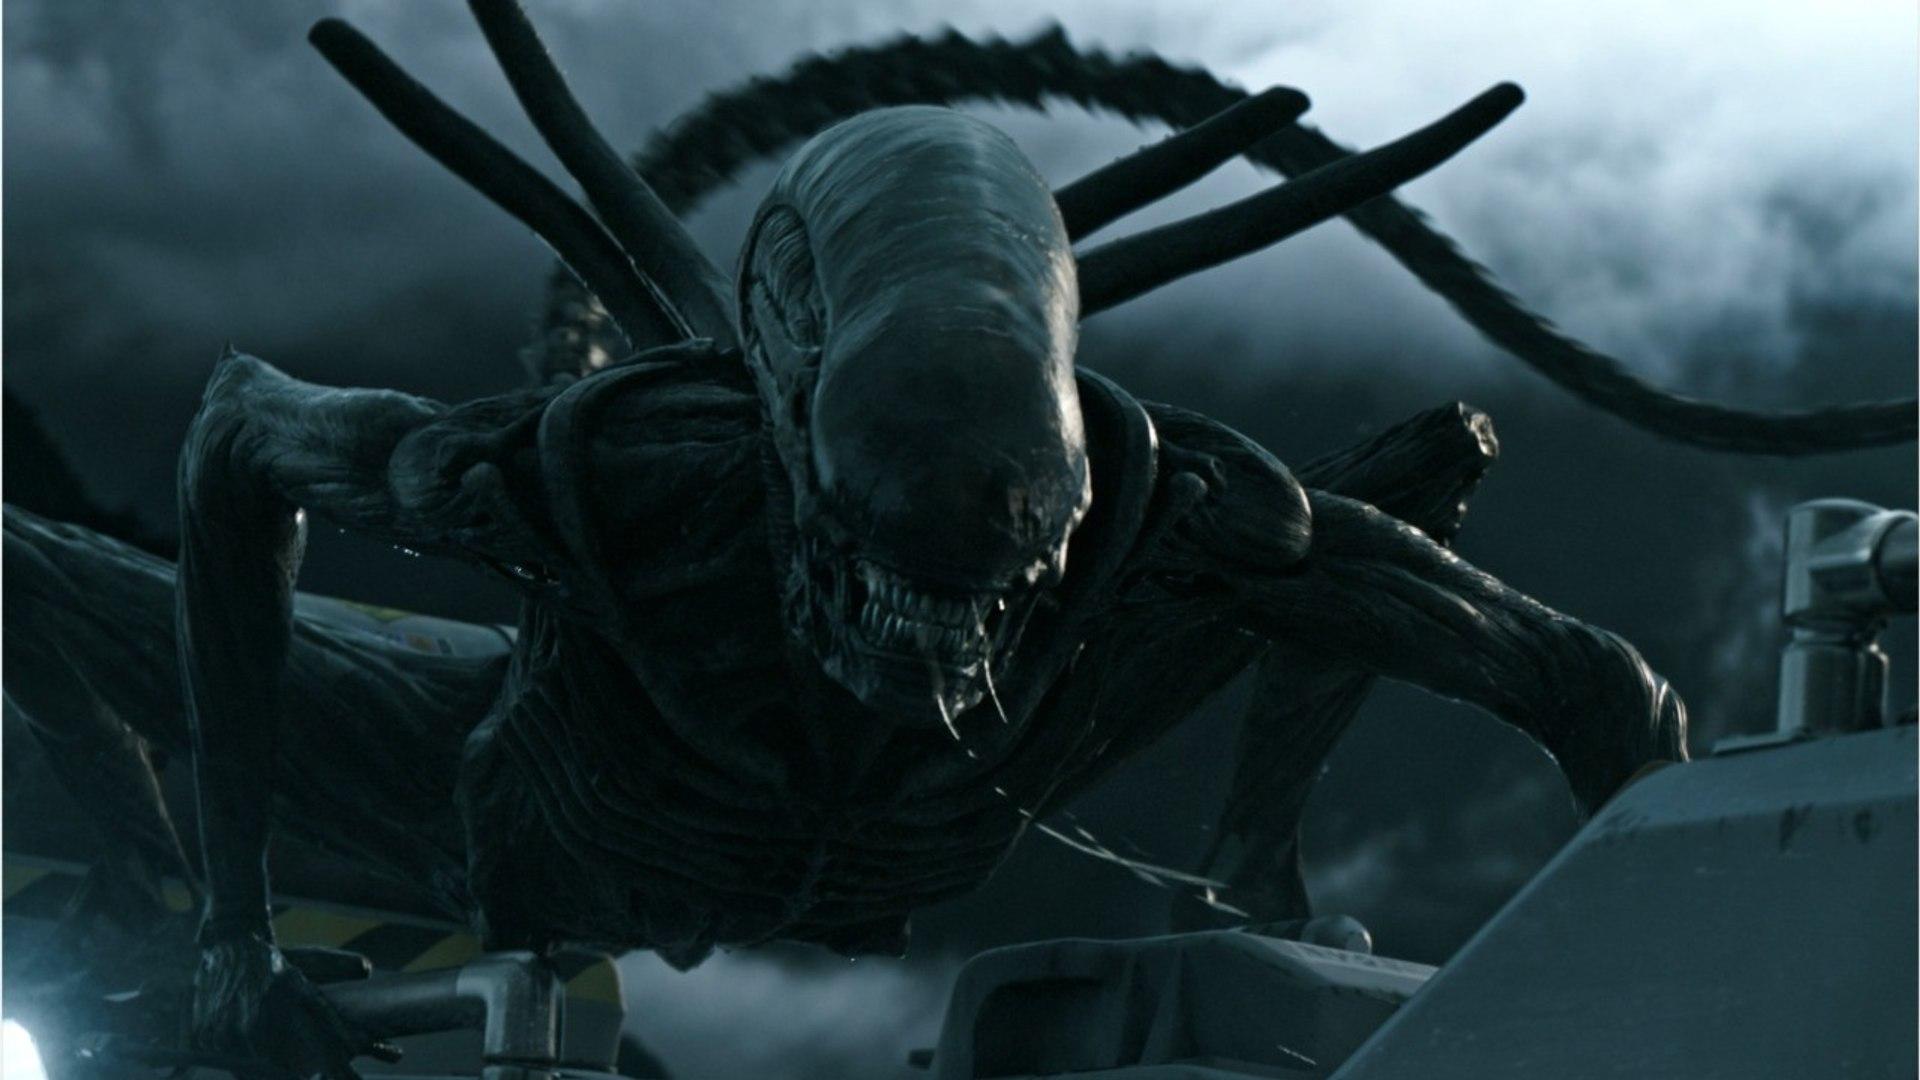 'Alien: Covenant' Wins Box Office